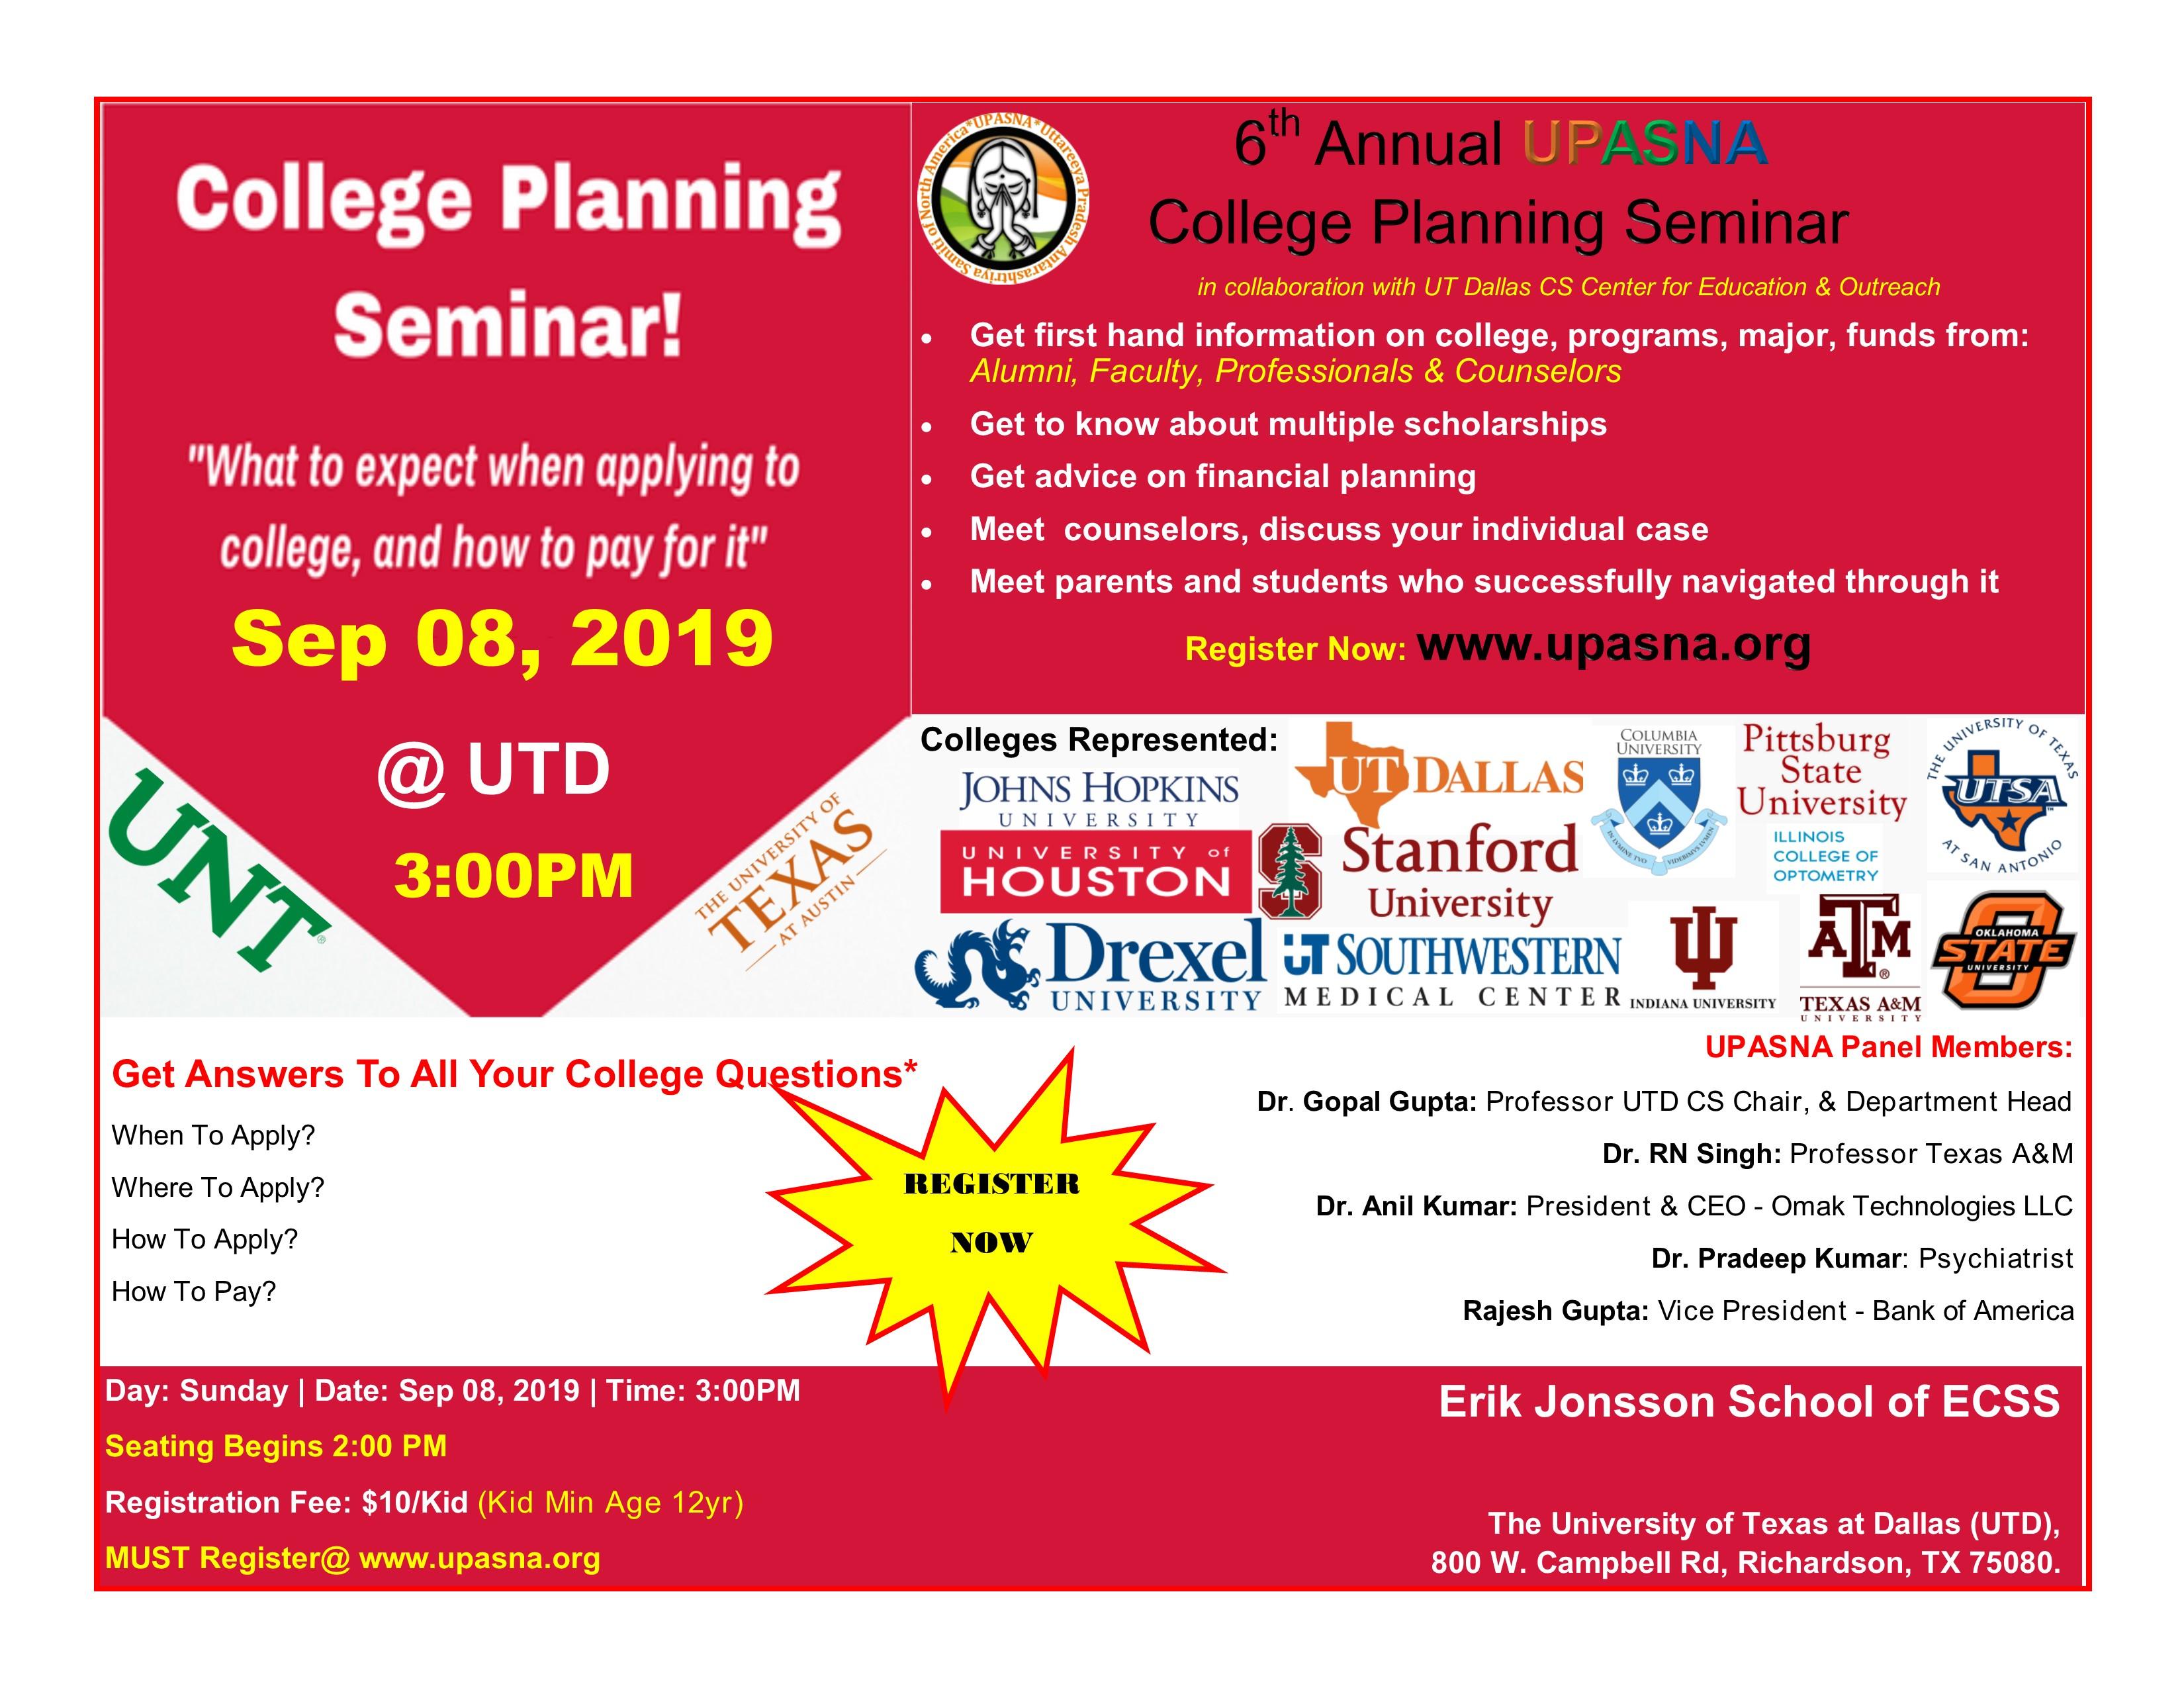 College Planning 2019